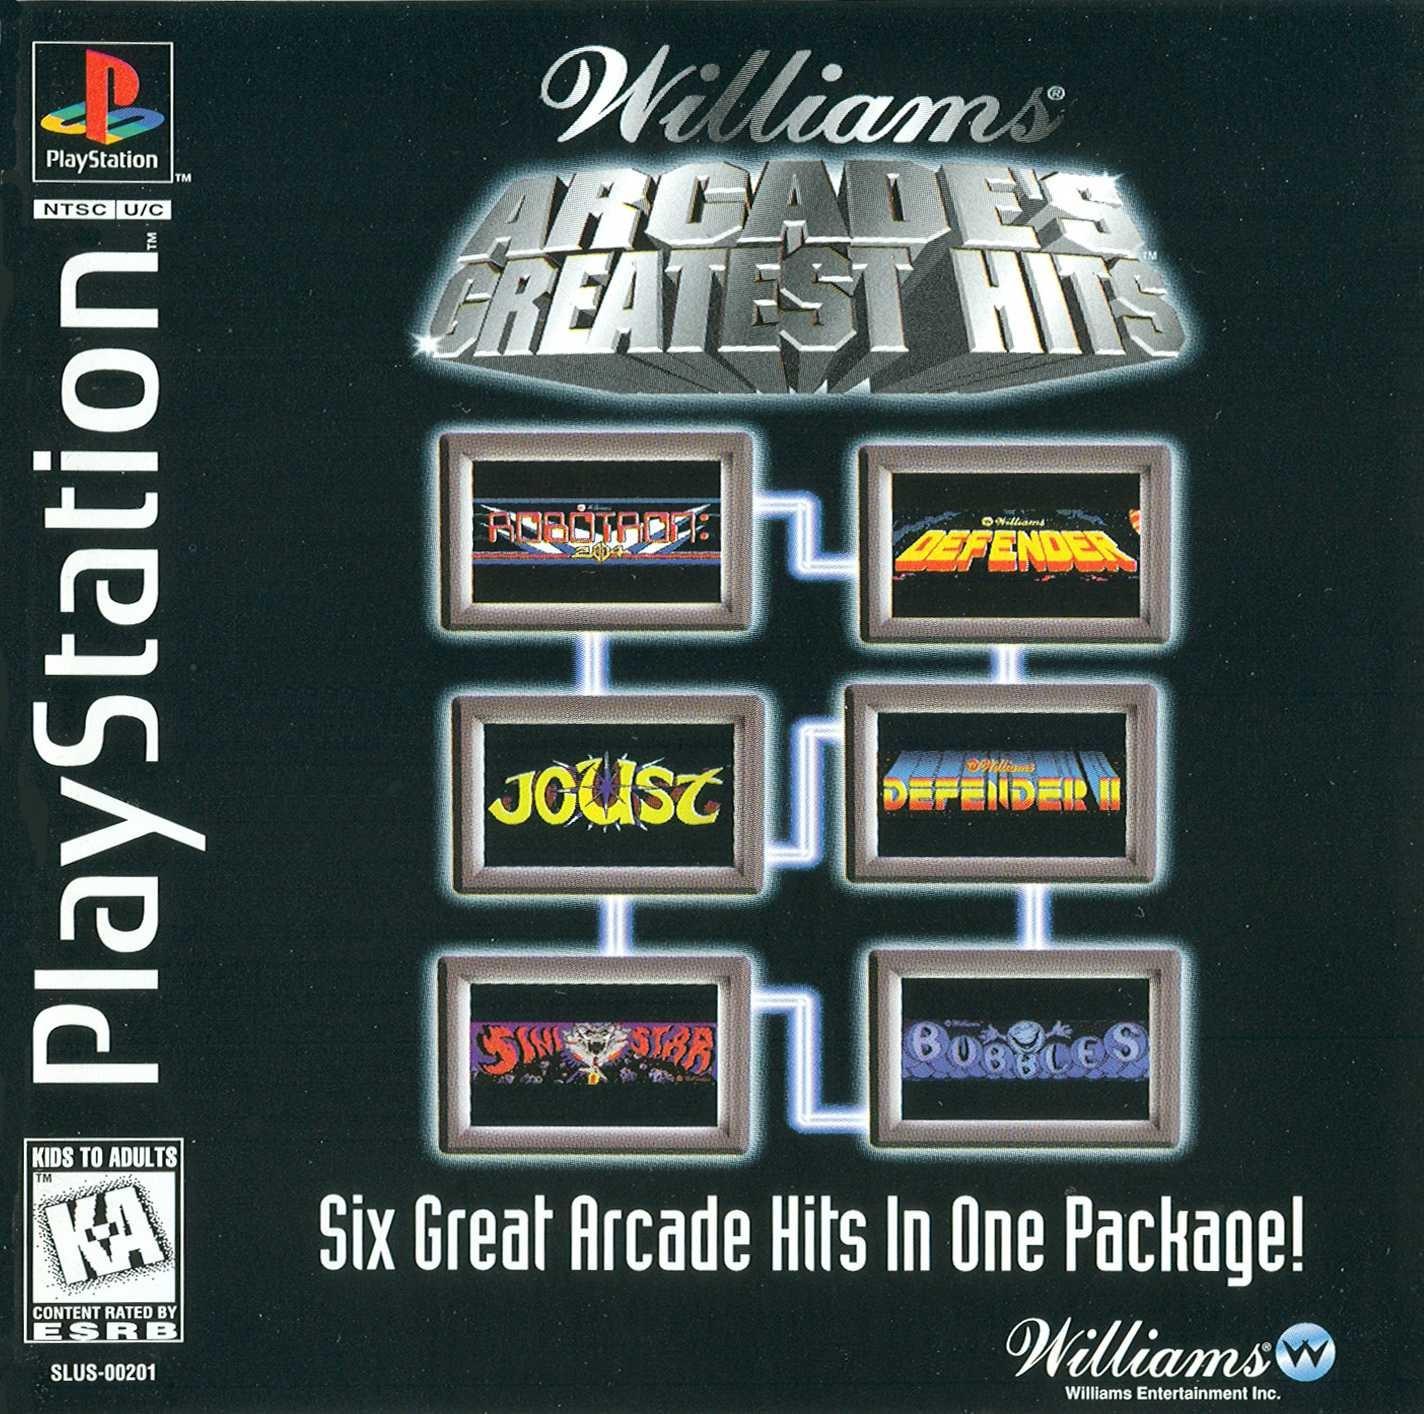 Williams Arcade Greatest